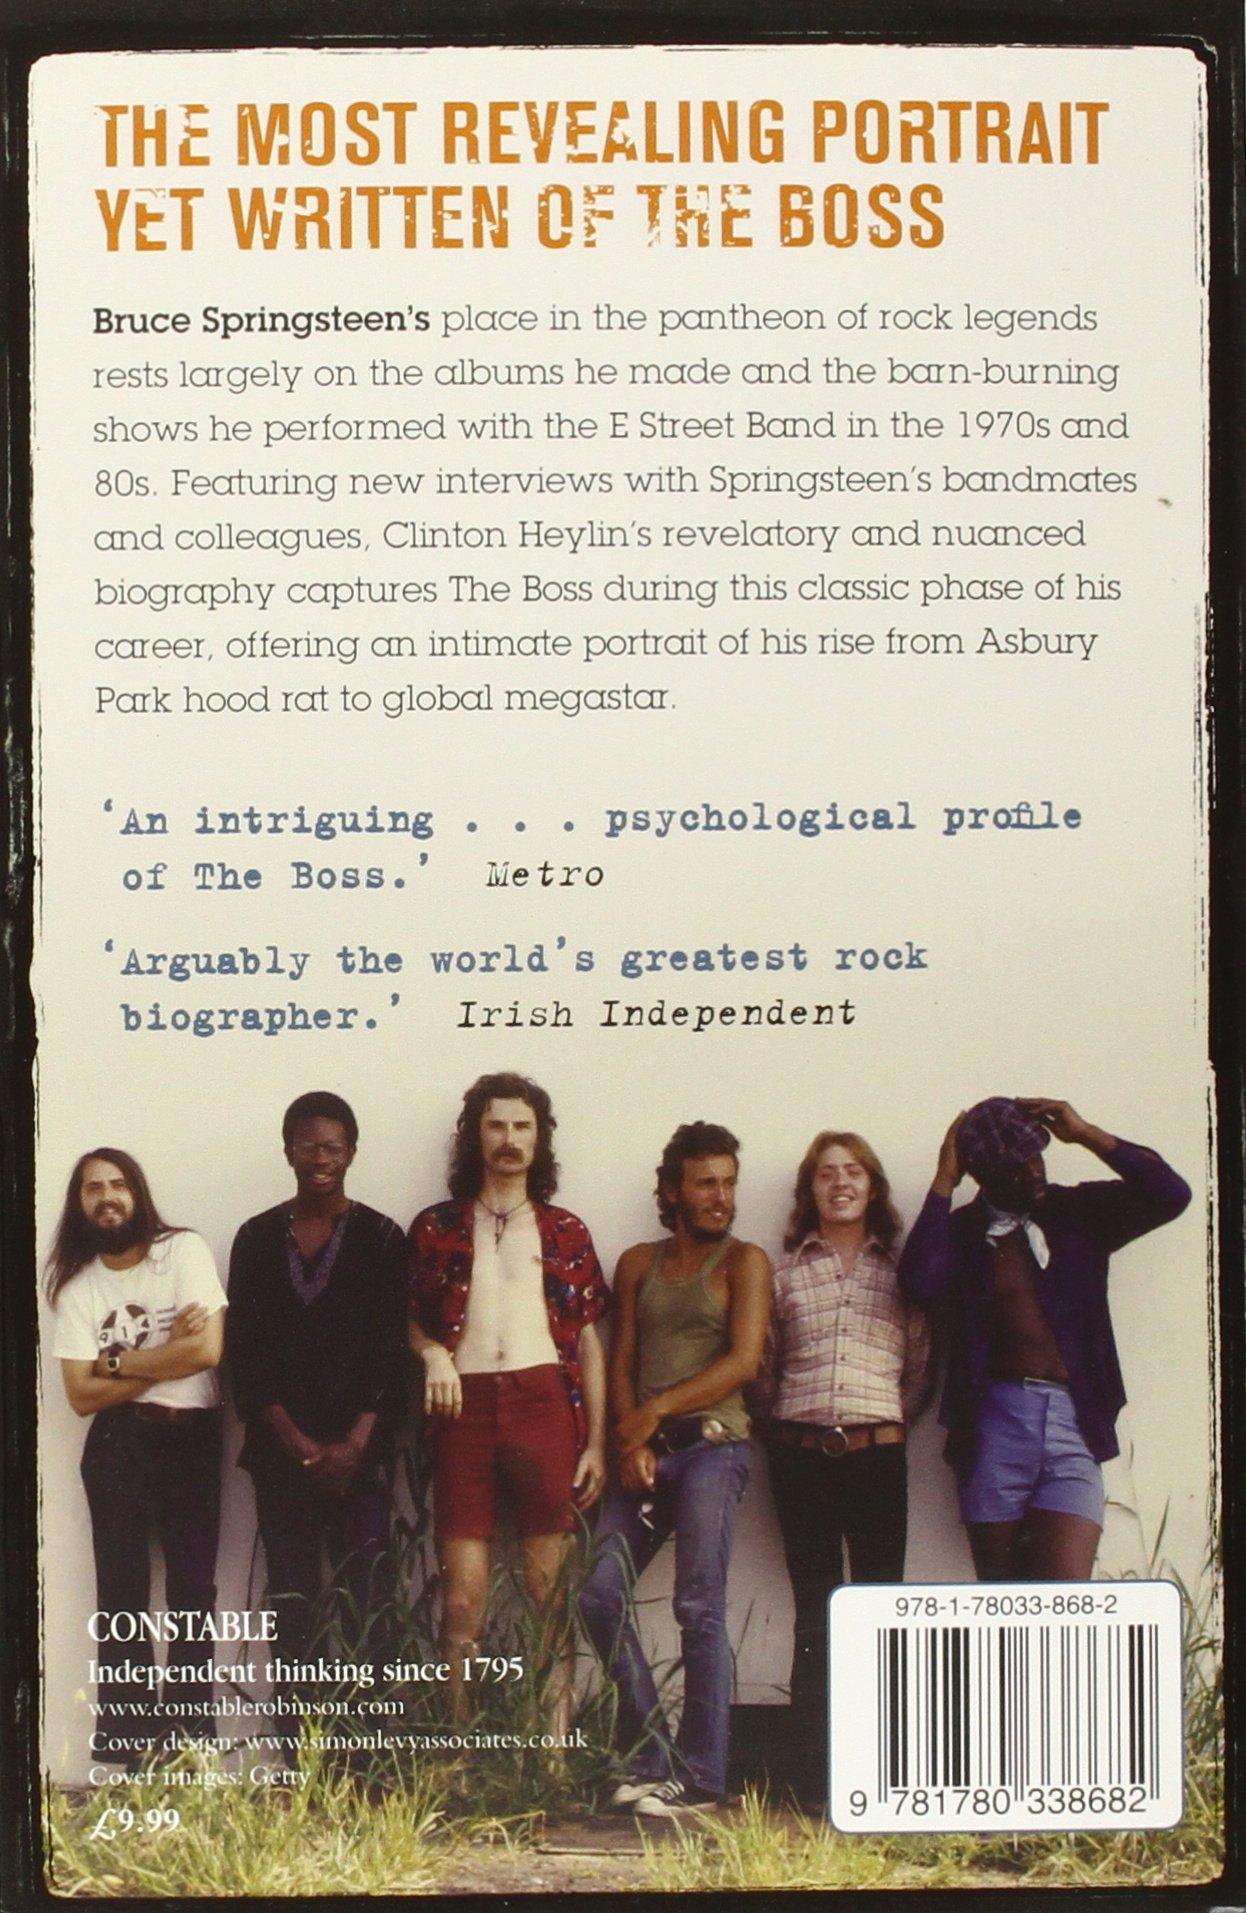 E Street Shuffle: The Glory Days Of Bruce Springsteen And The E Street  Band: Amazon: Clinton Heylin: 9781780338682: Books